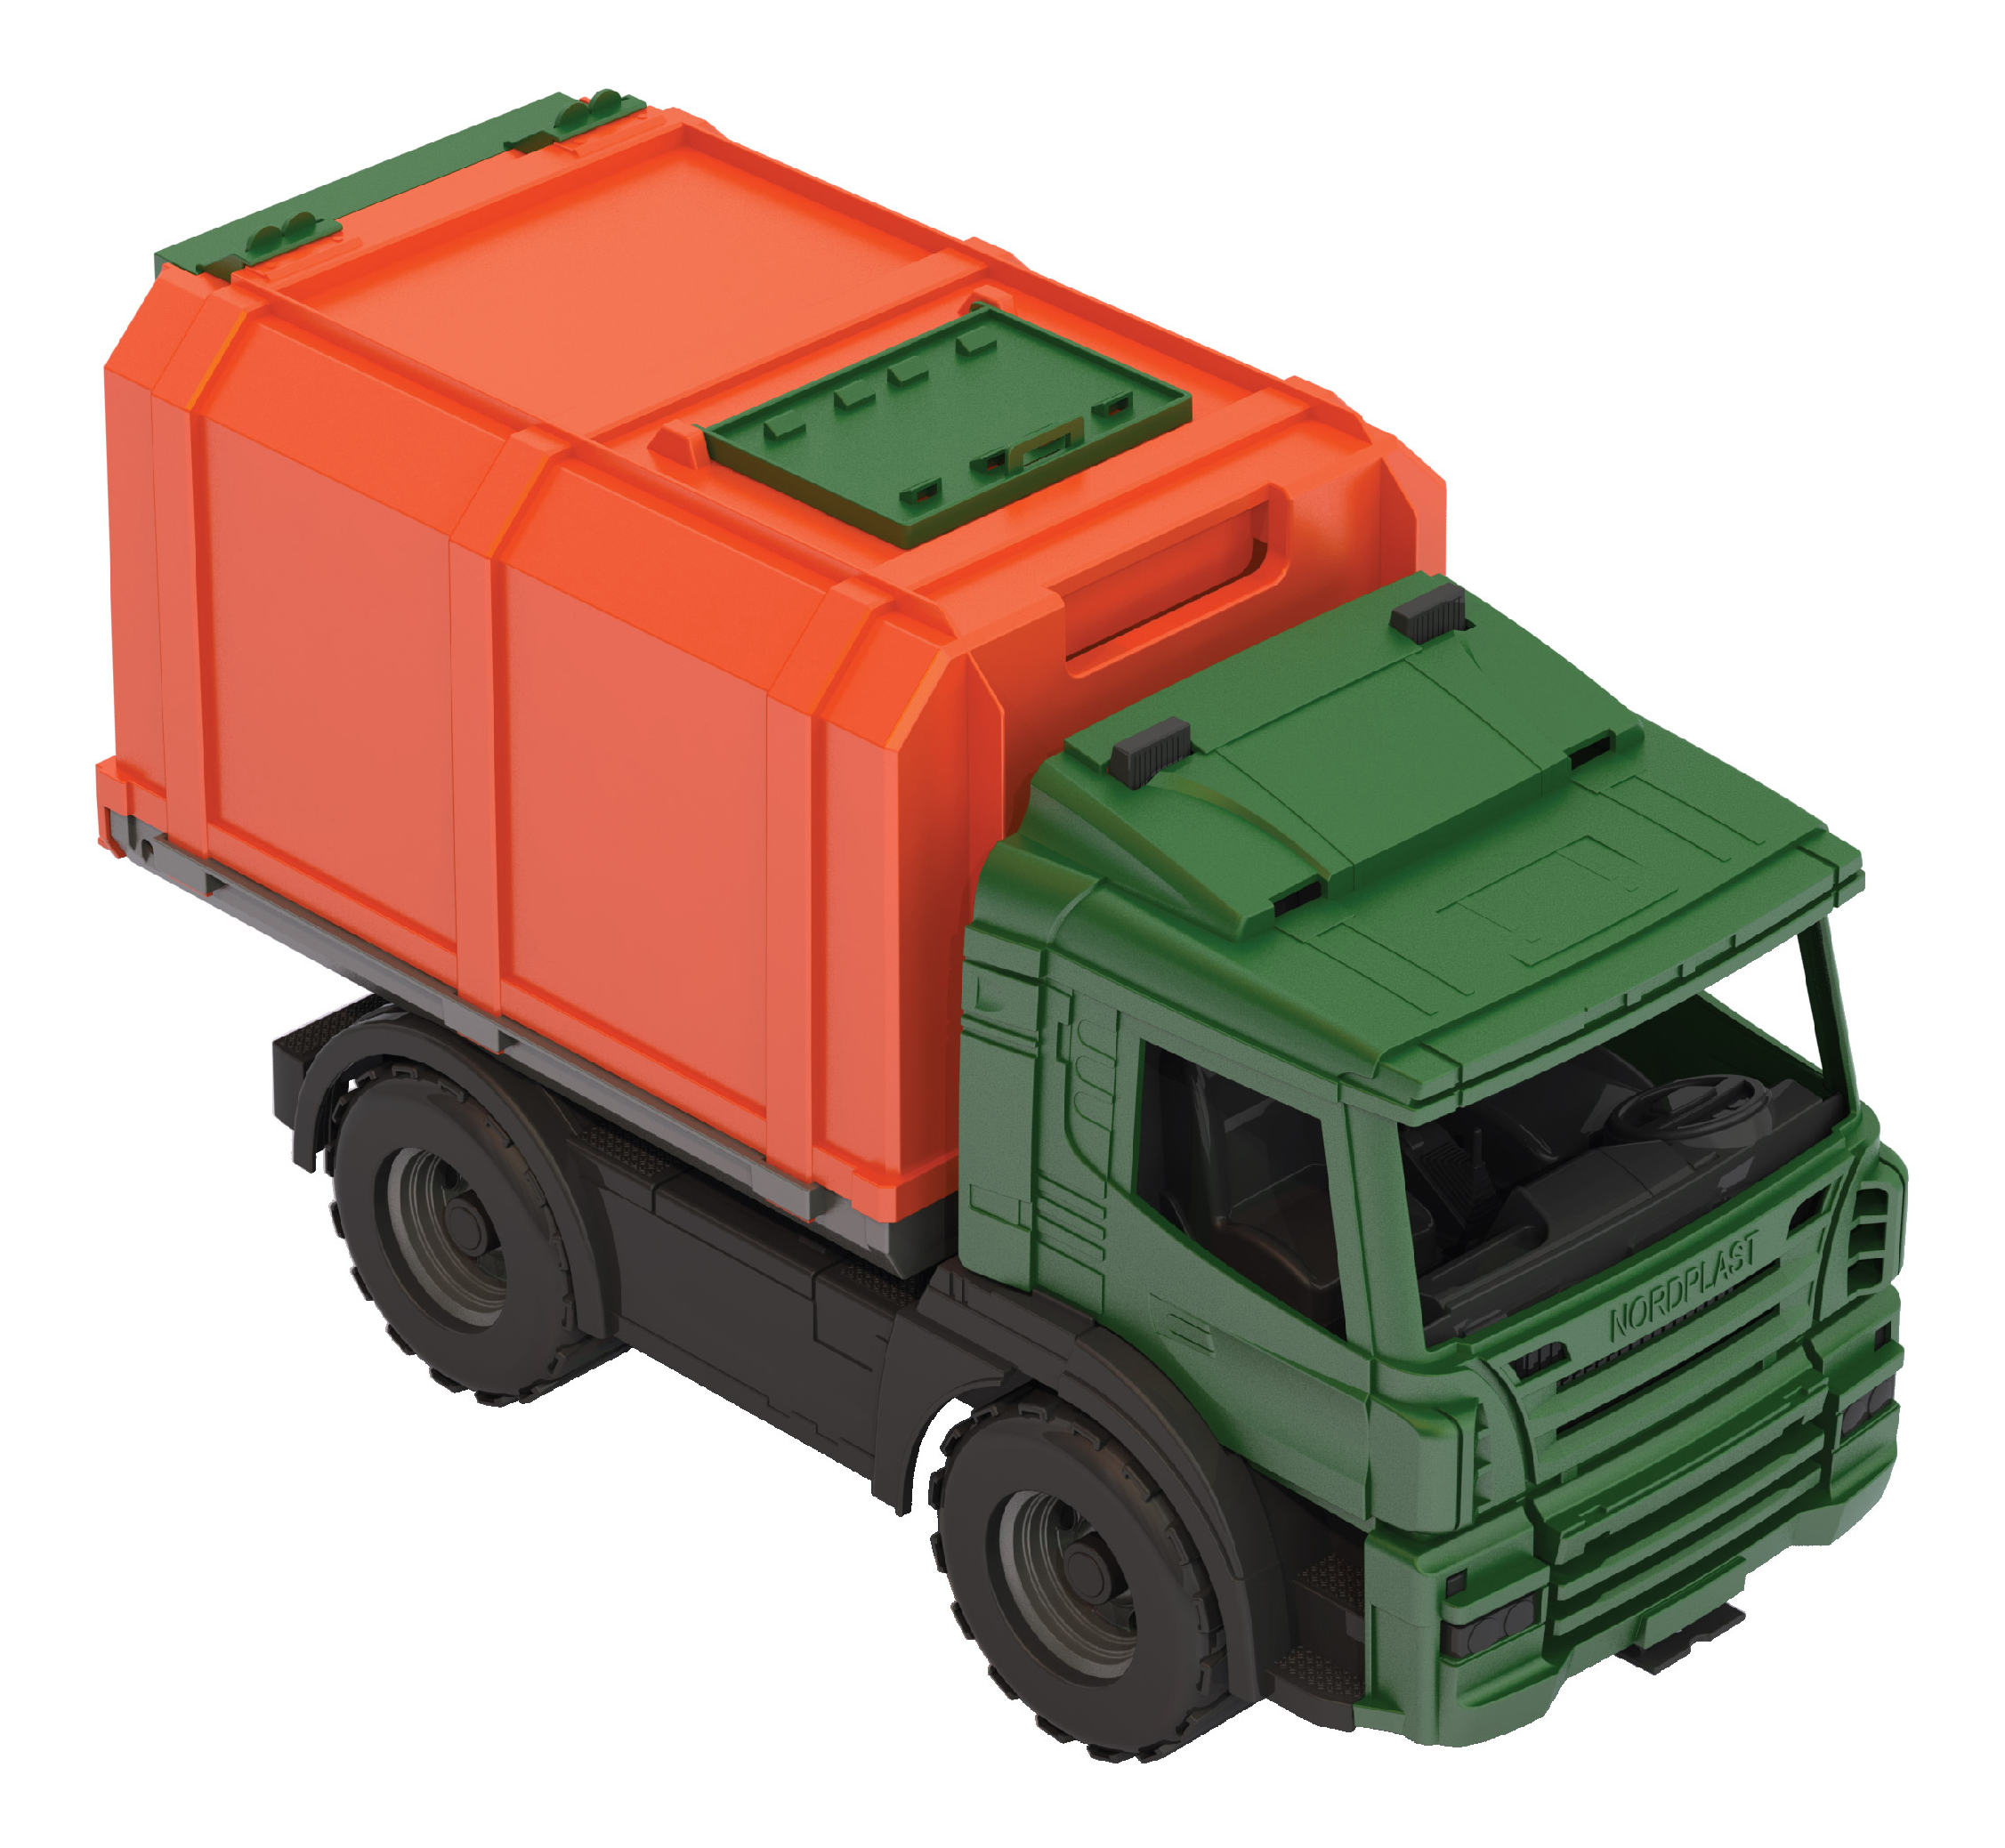 Купить Игрушка НОРДПЛАСТ Фургон из серии Спецтехника,